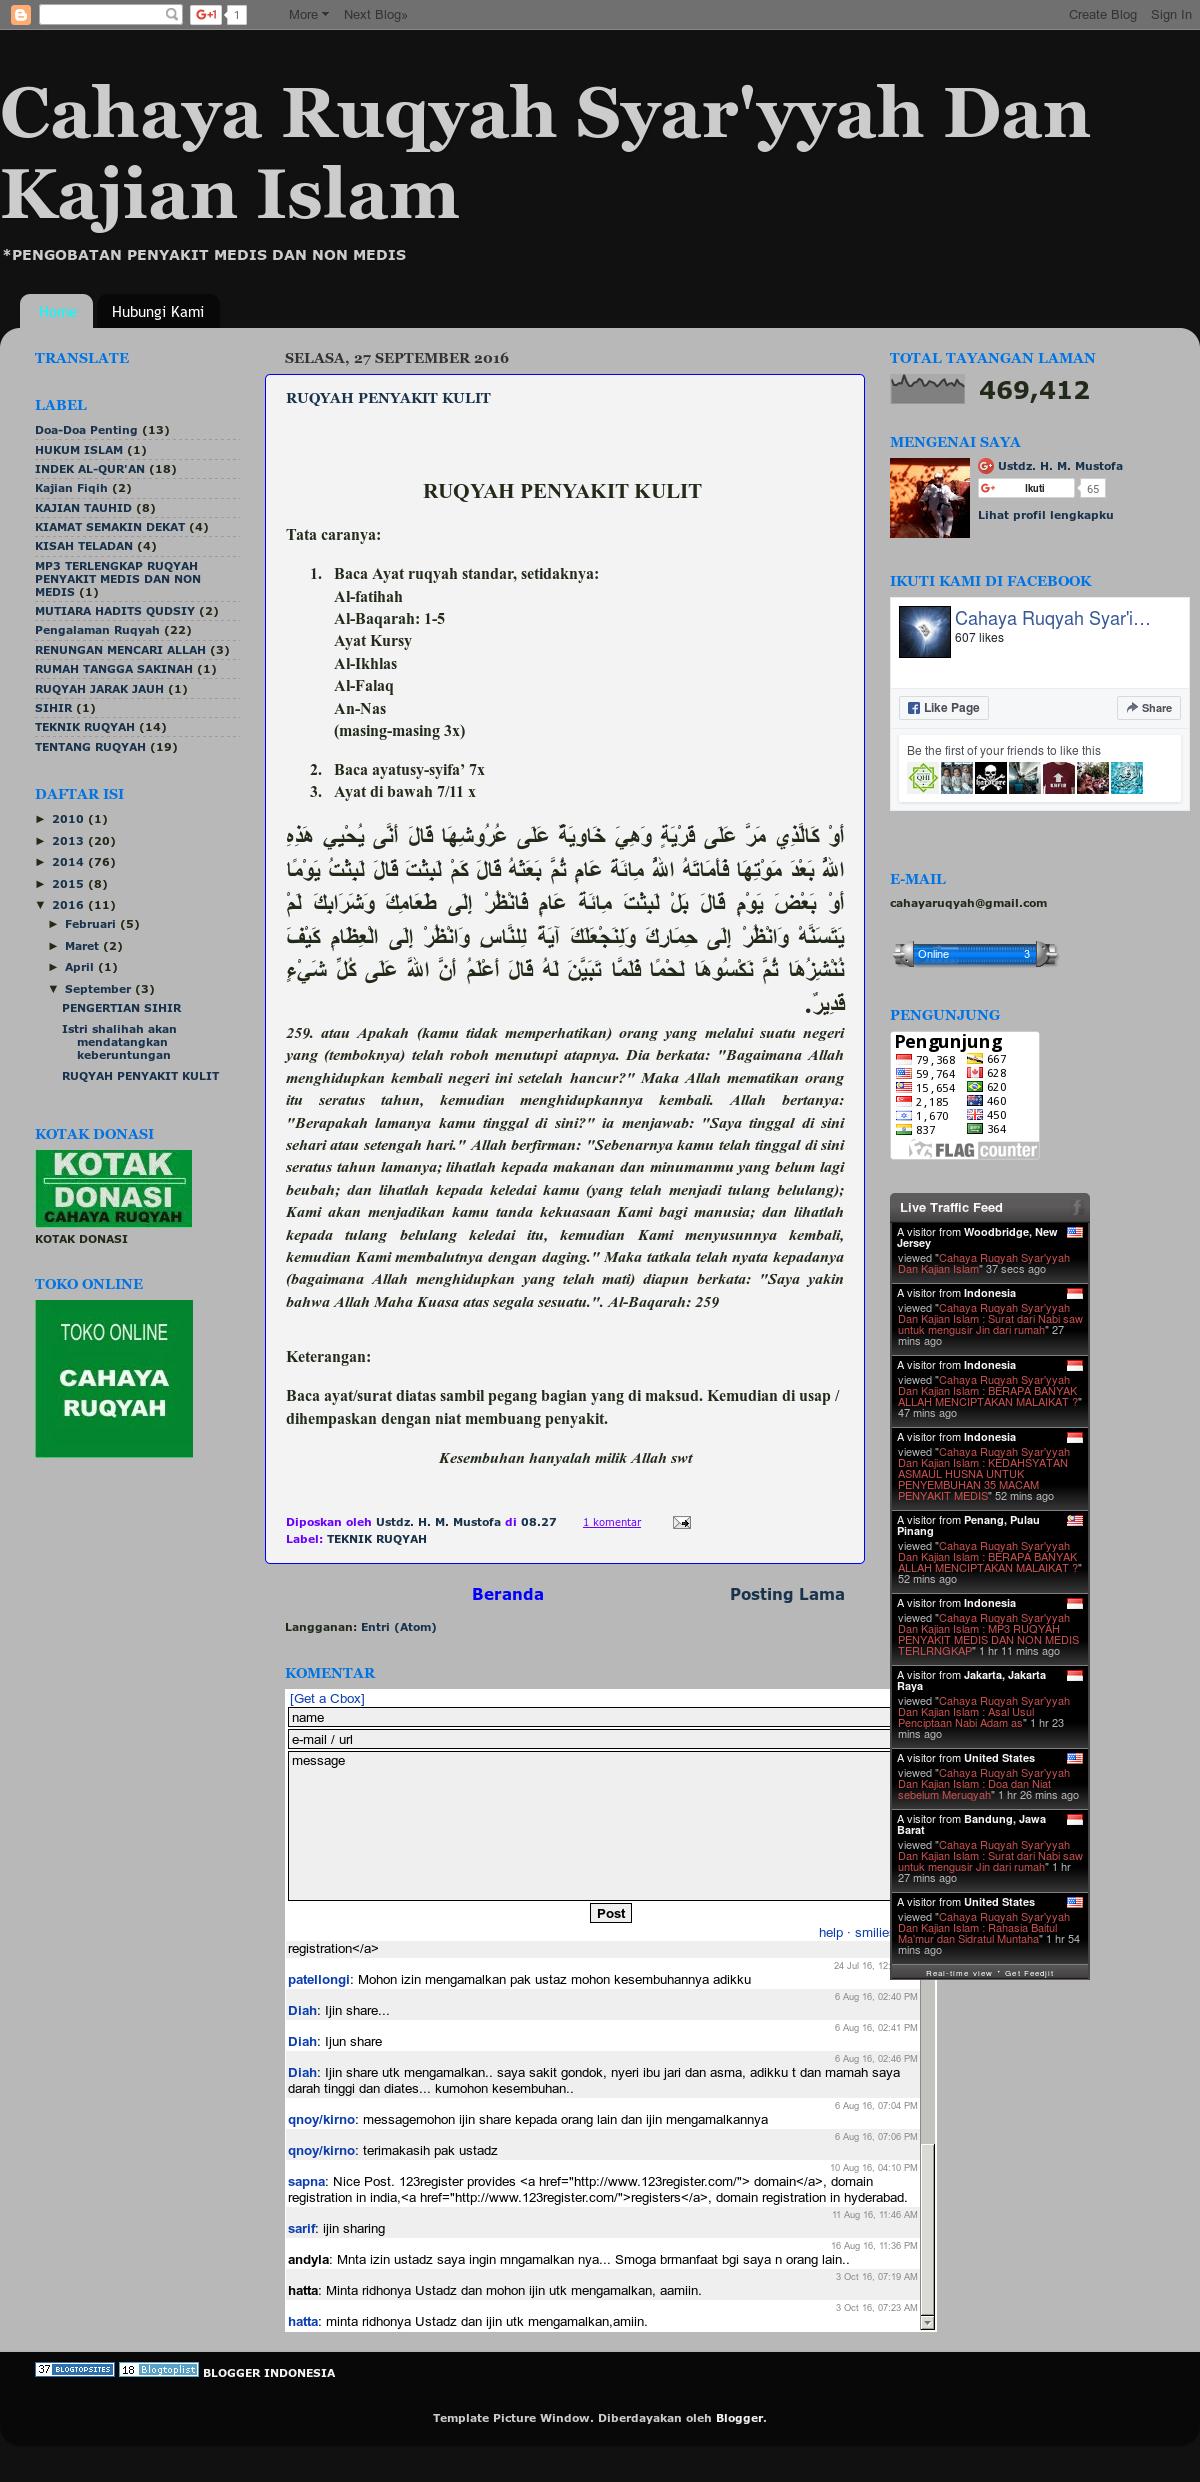 Cahaya Ruqyah Syar'iyyah Competitors, Revenue and Employees